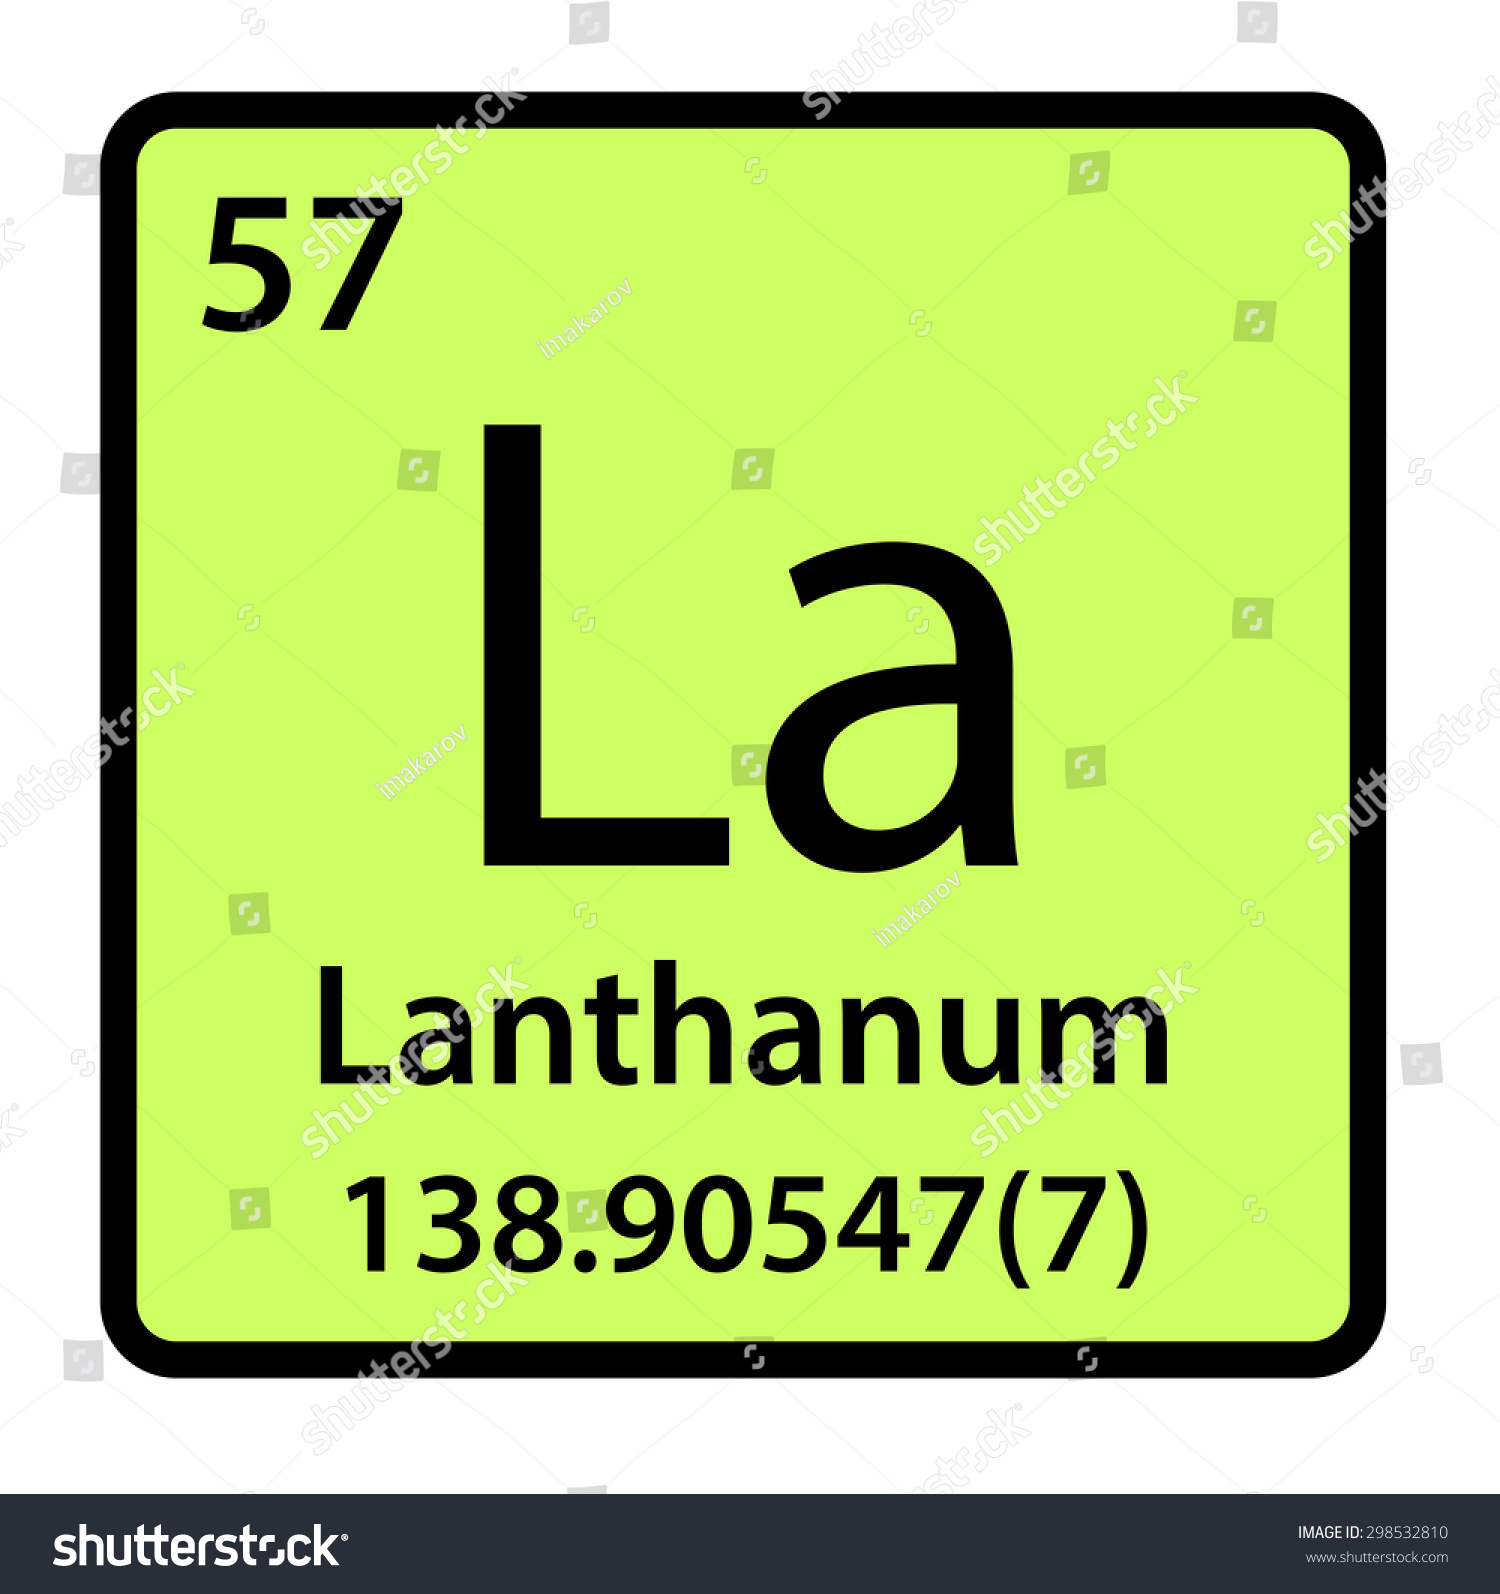 Element lanthanum periodic table stock illustration 298532810 element lanthanum of the periodic table gamestrikefo Gallery